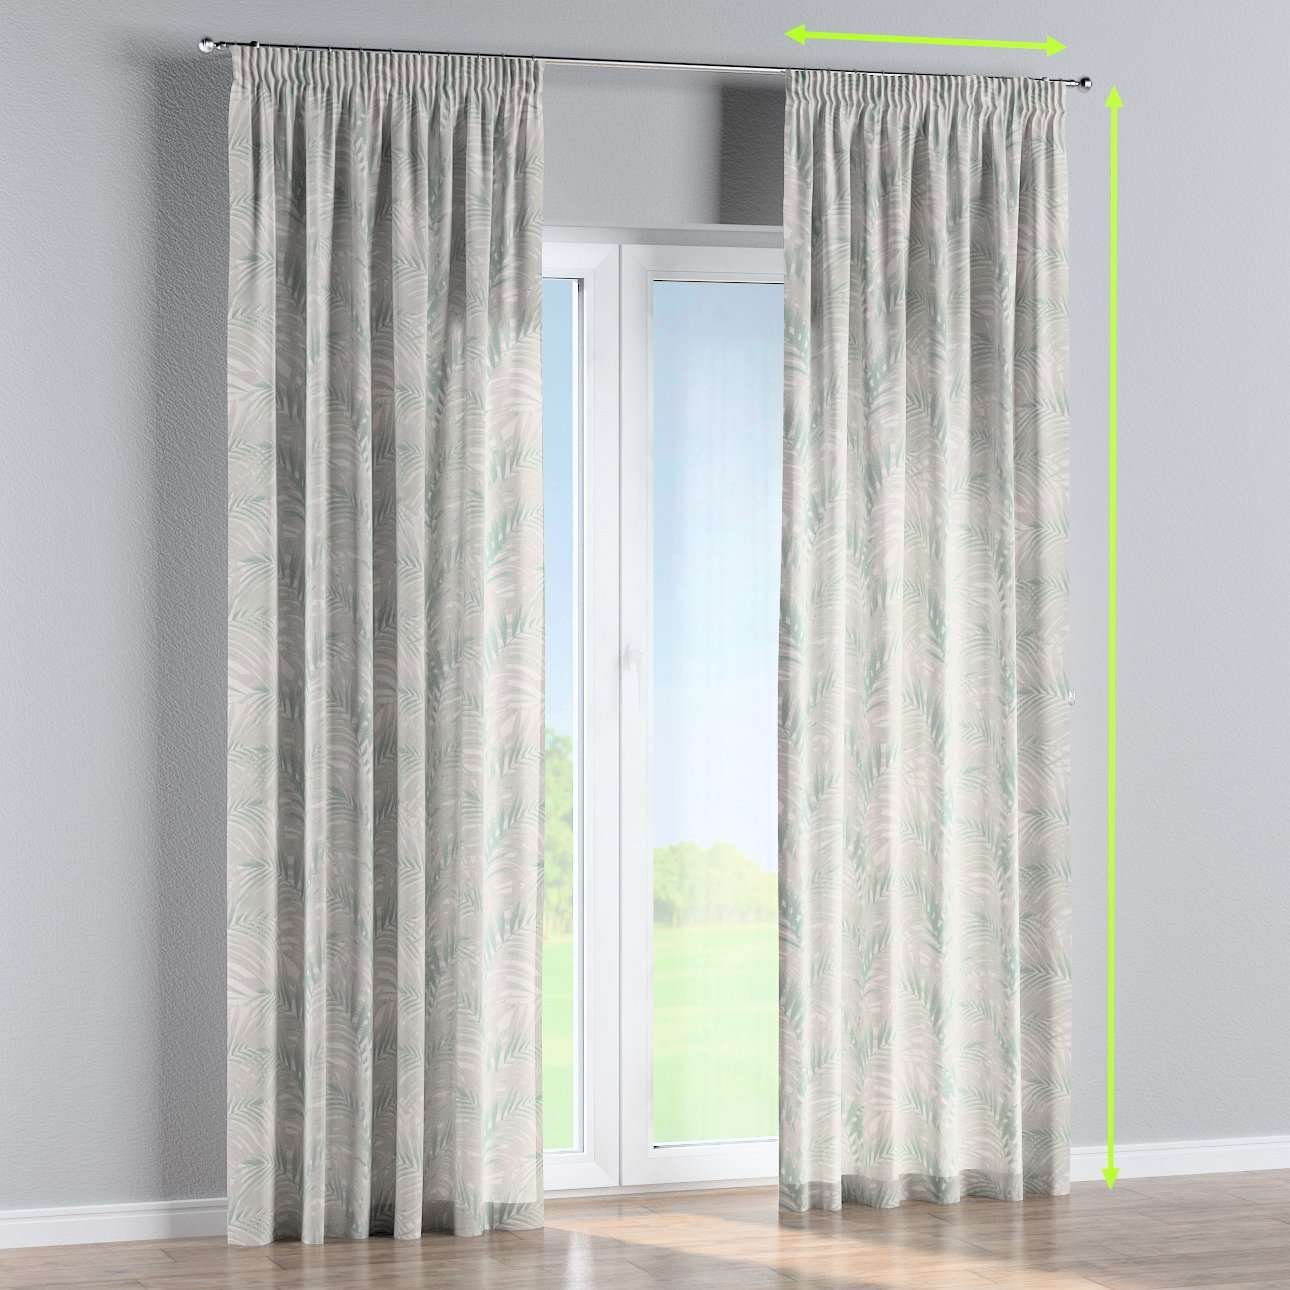 Pencil pleat curtain in collection Gardenia, fabric: 142-15